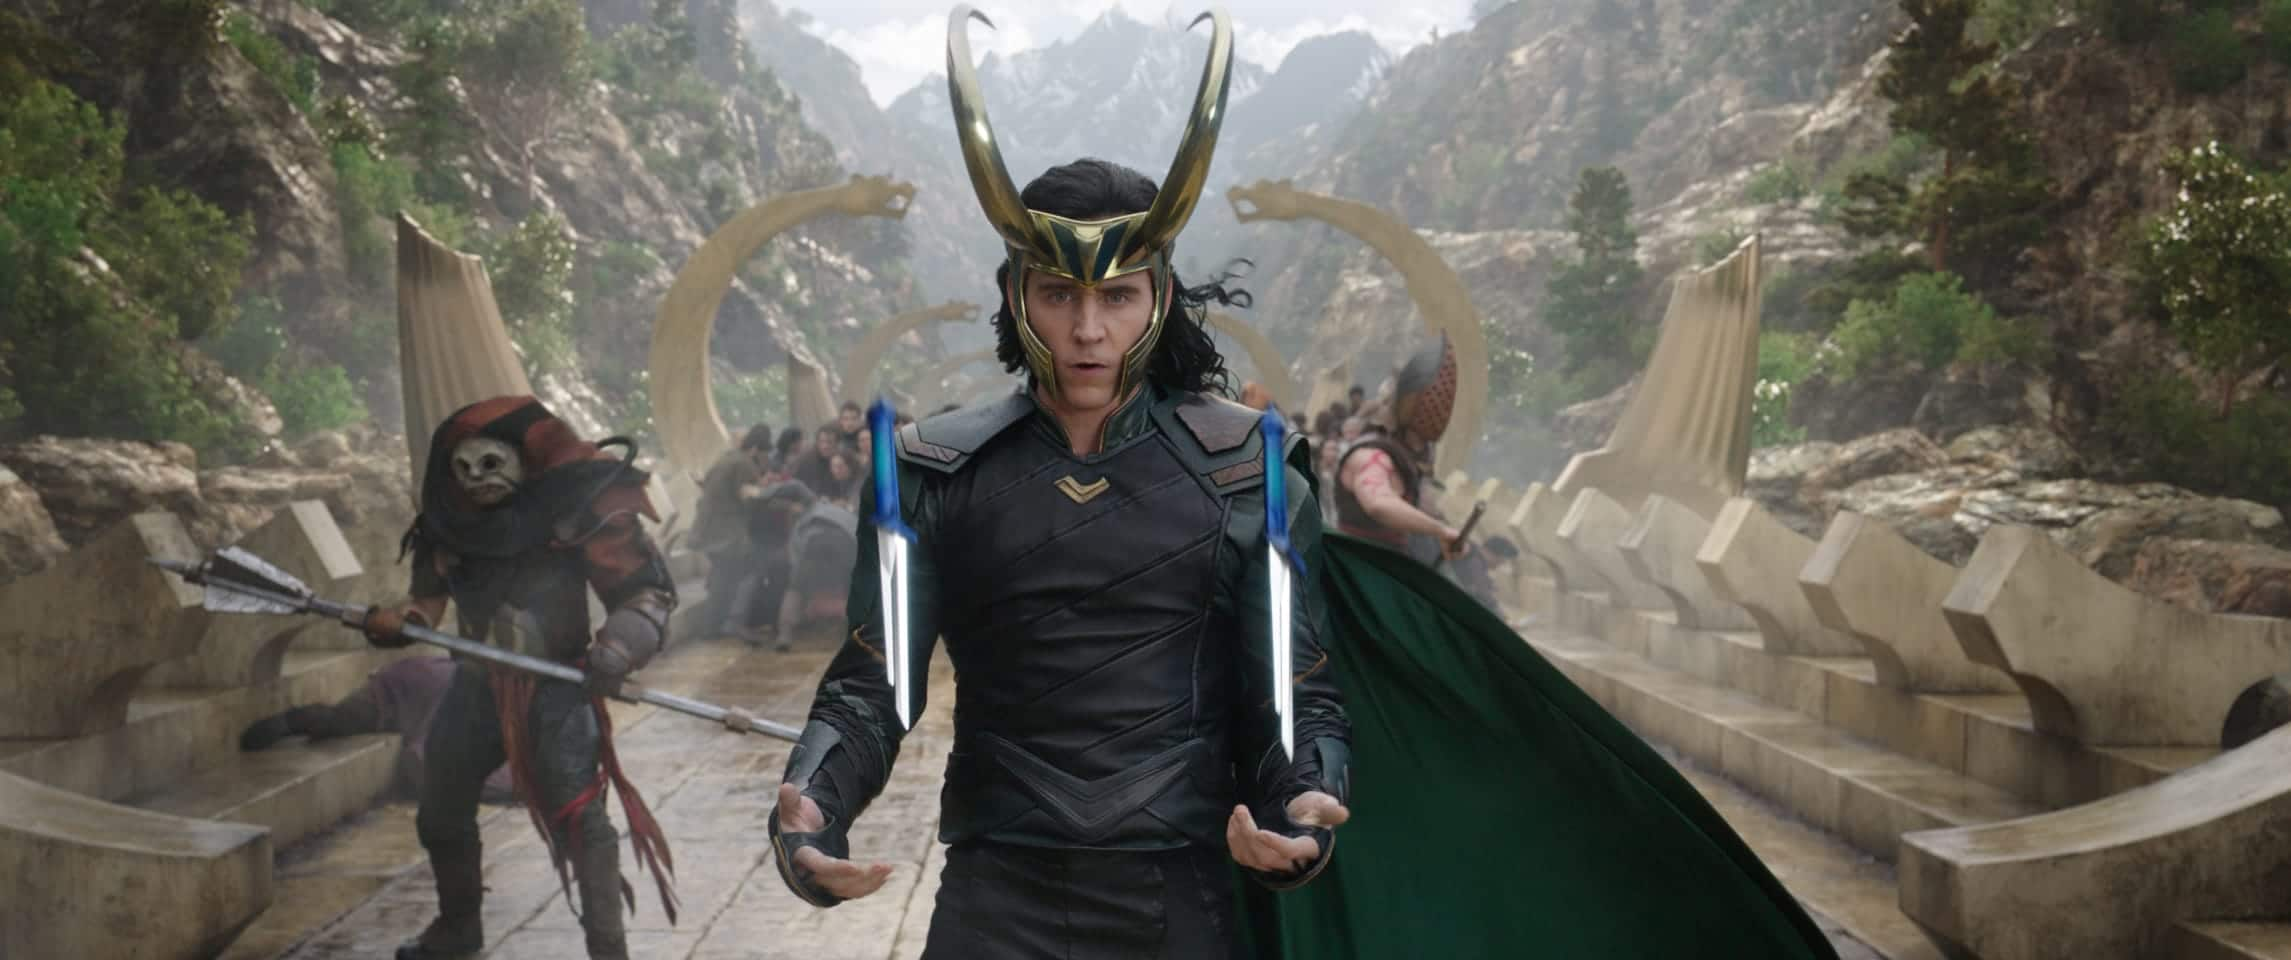 Thor Ragnarok - Tom Hiddleston as Loki